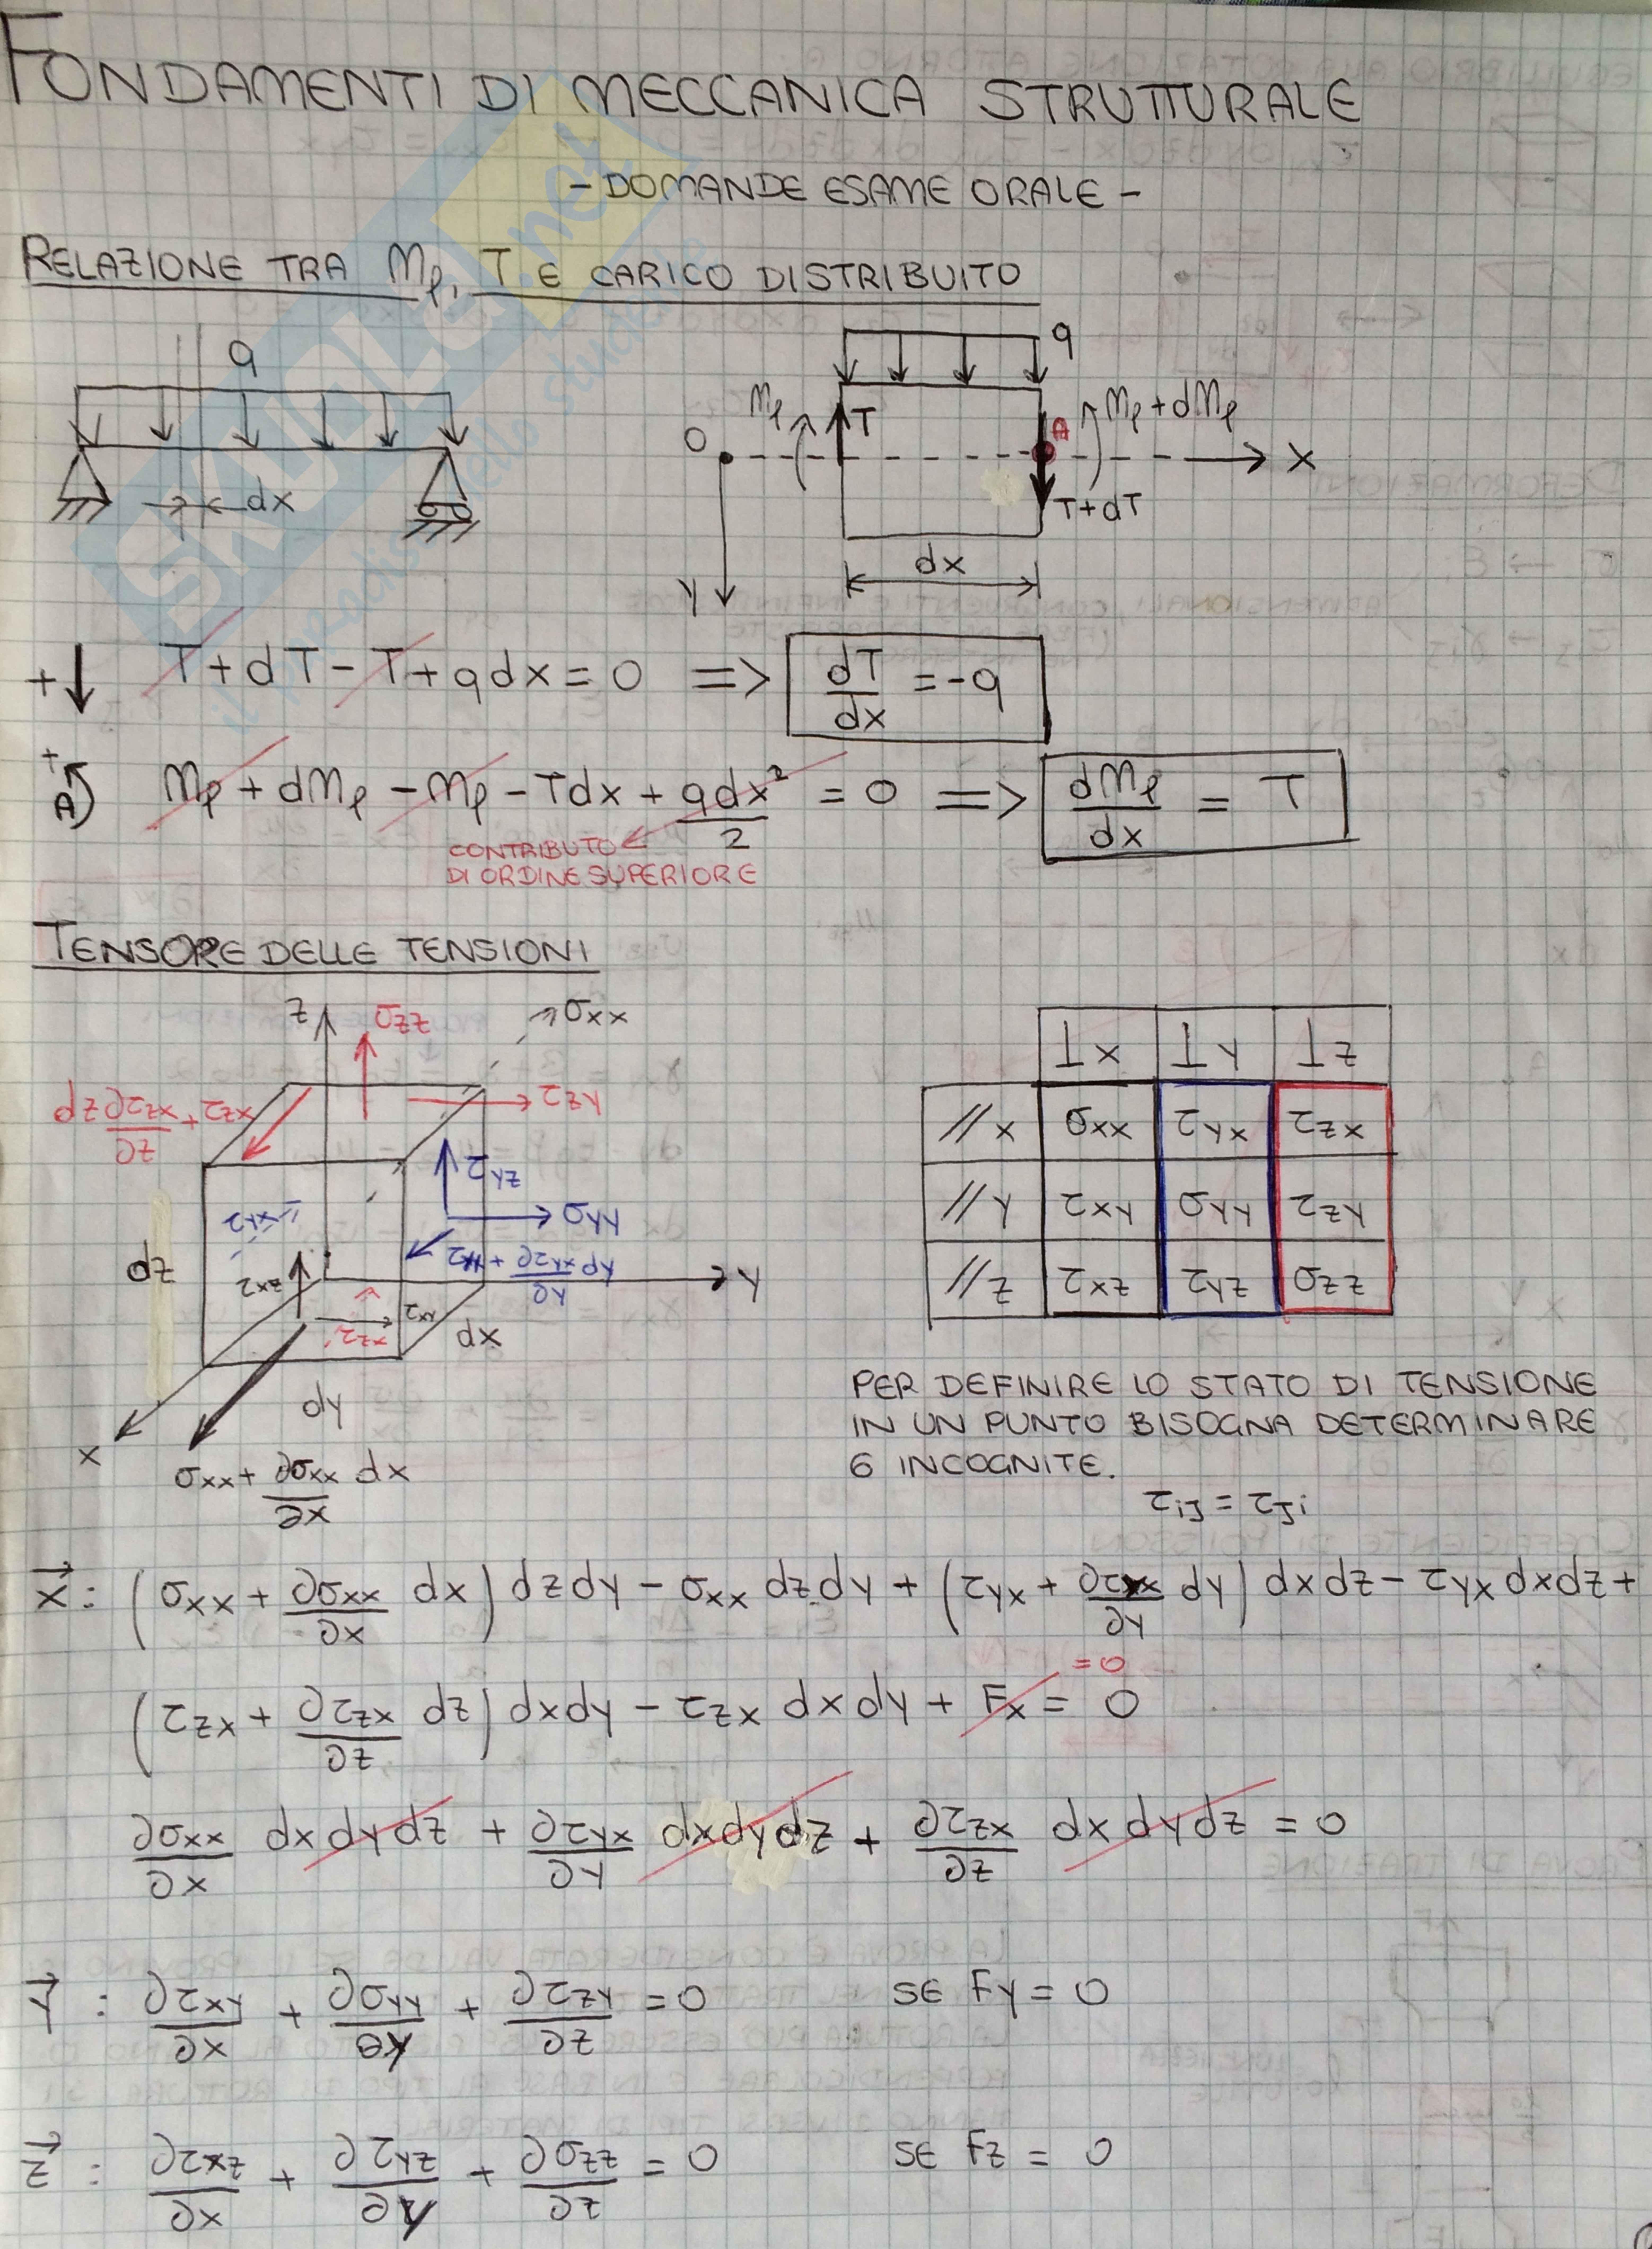 Dimostrazioni orale fondamenti di meccanica strutturale